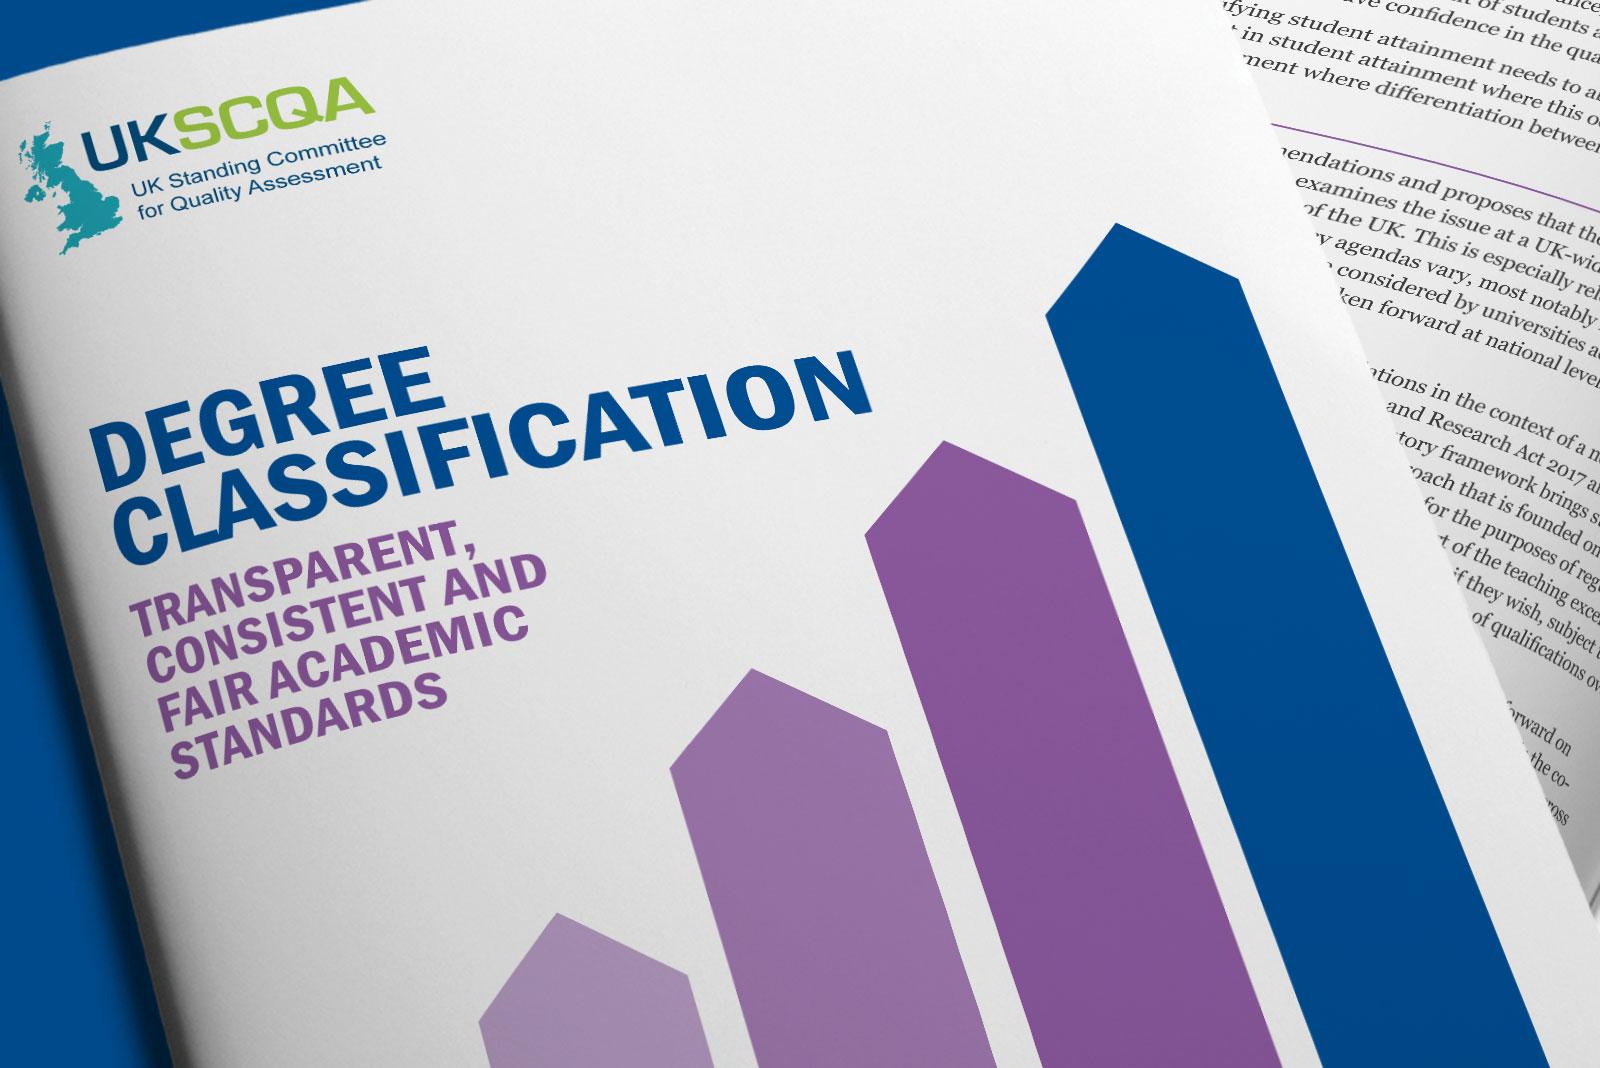 Degree classification report by Universities UK